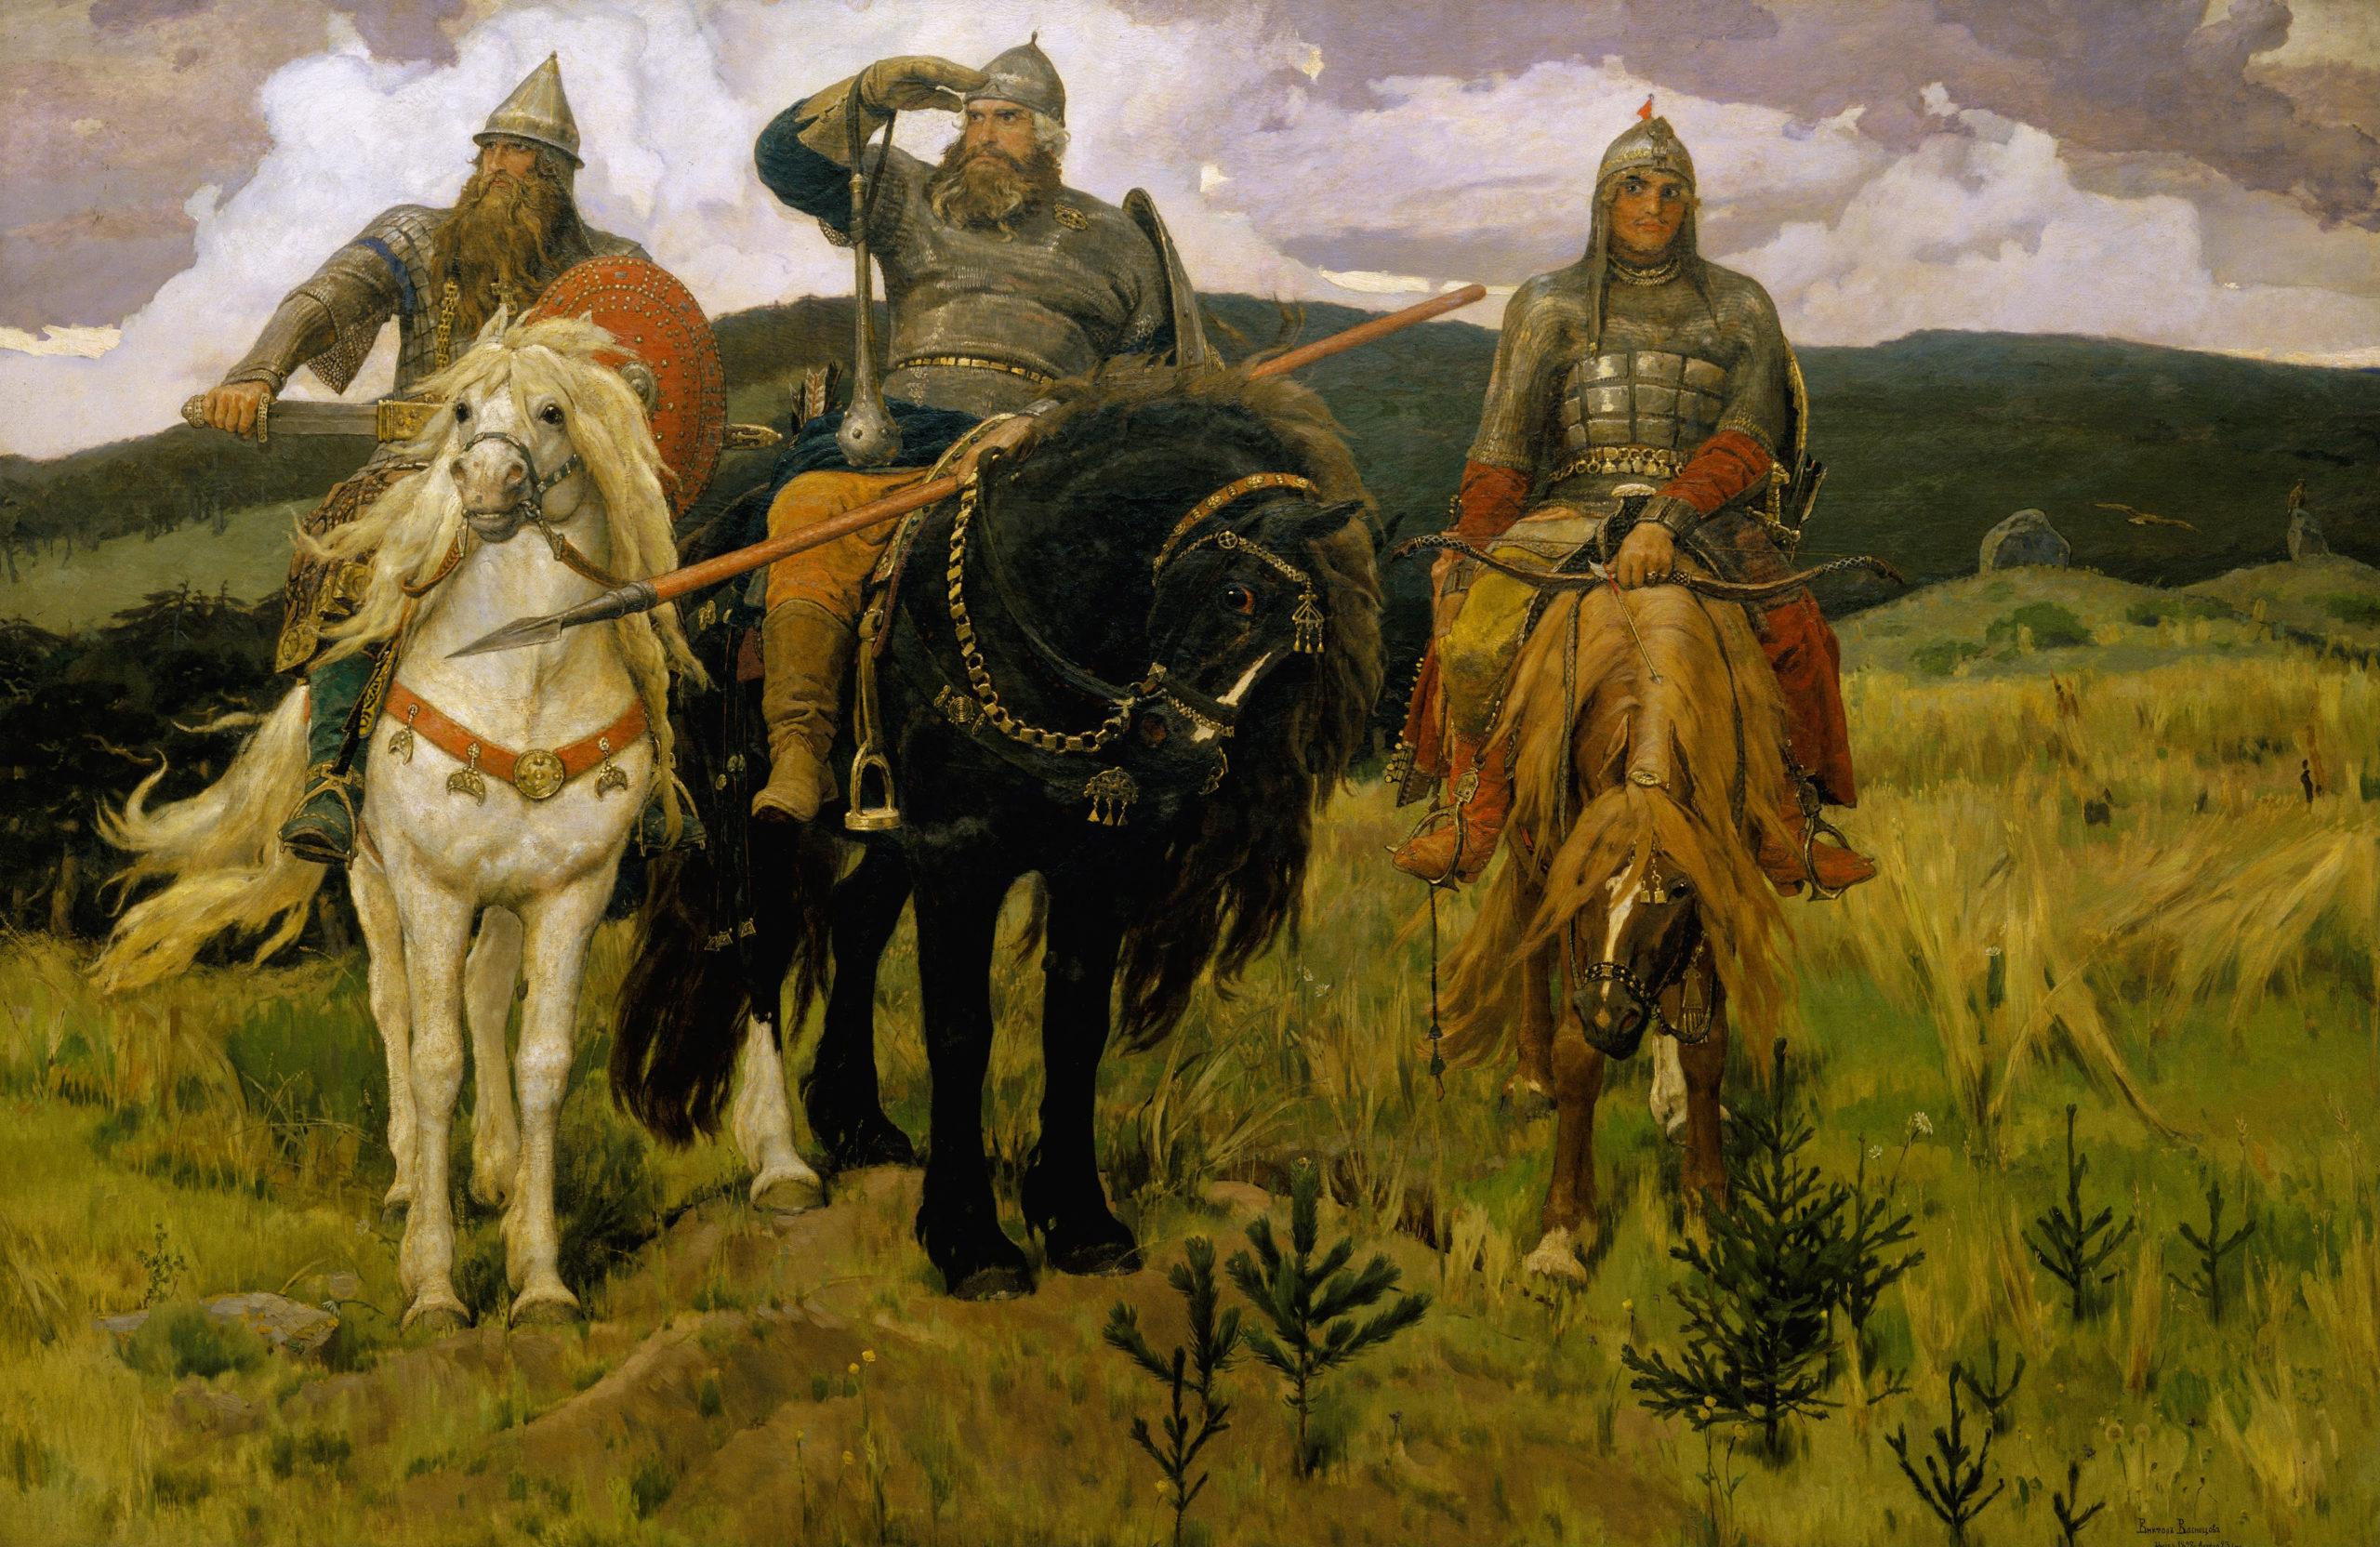 Виктор Васнецов, Богатыри